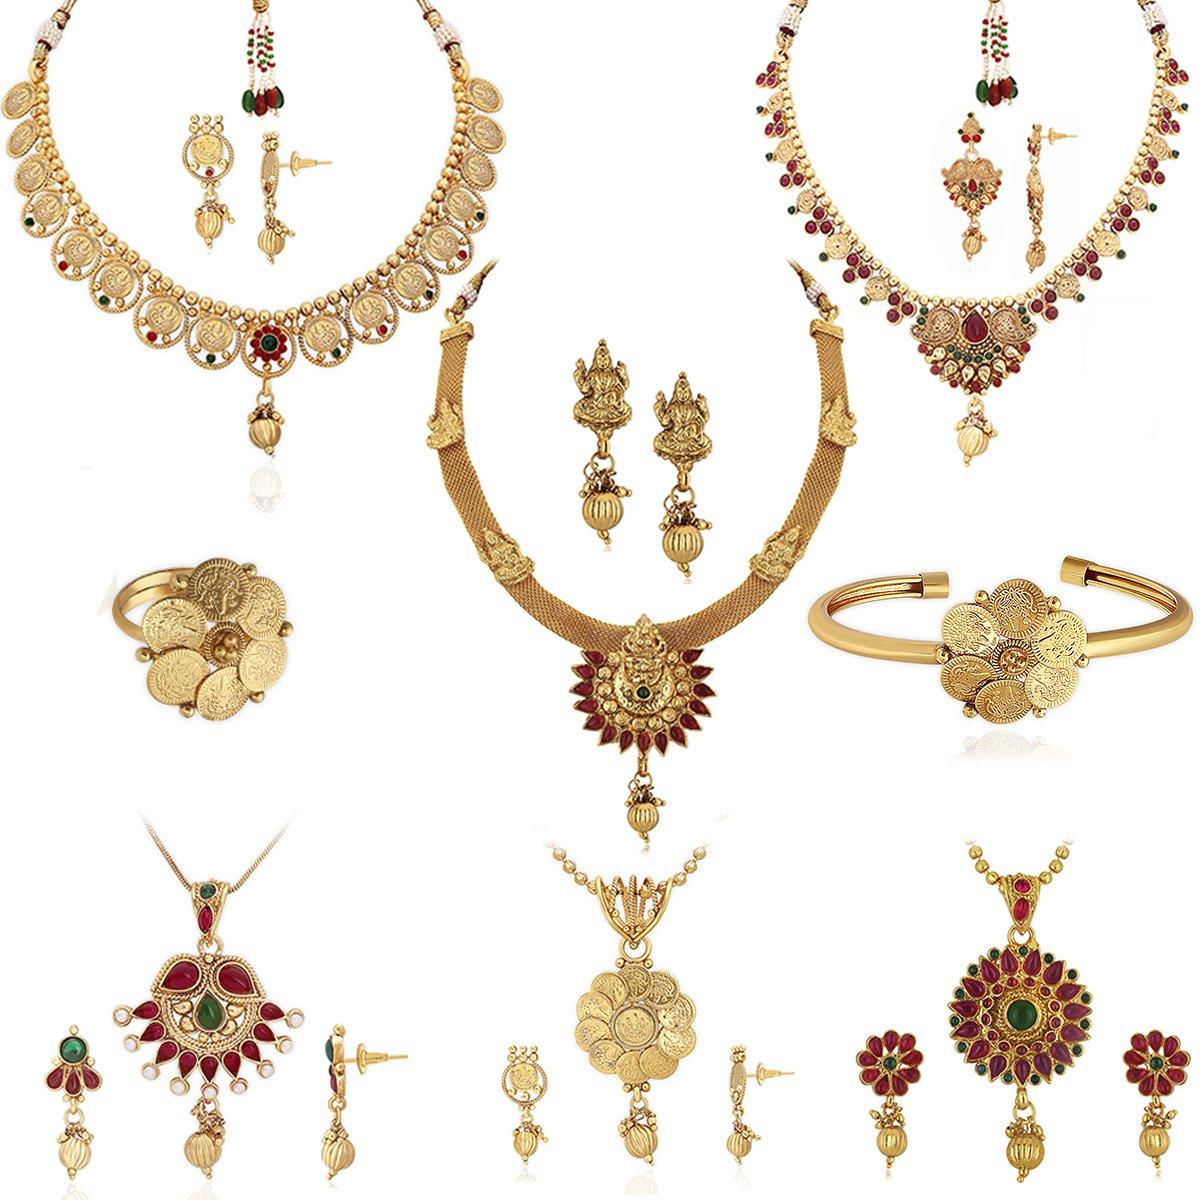 57d69bfe8ba51 Spargz Brass Gold Plated Combo Jewellery Set For Women (3 Necklace Set, 3  Pendant Set, 1 Kada, 1 Ring)